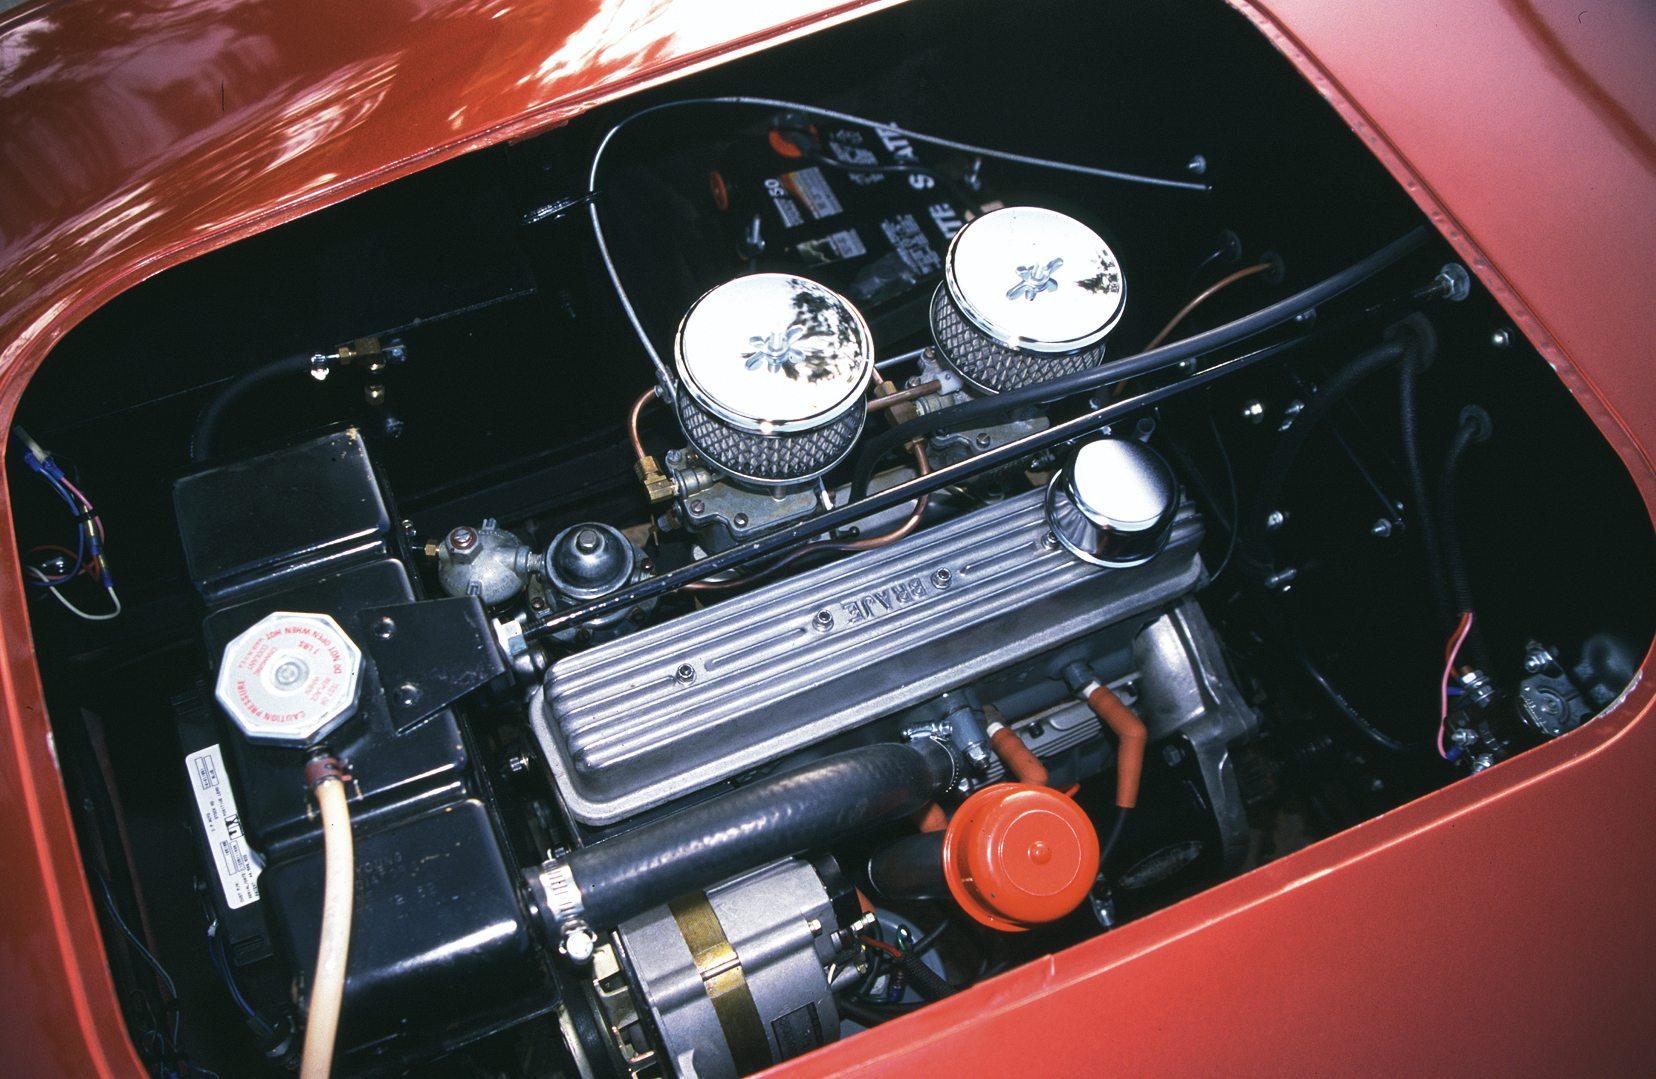 Crosley Hot Shot four cylinder engine